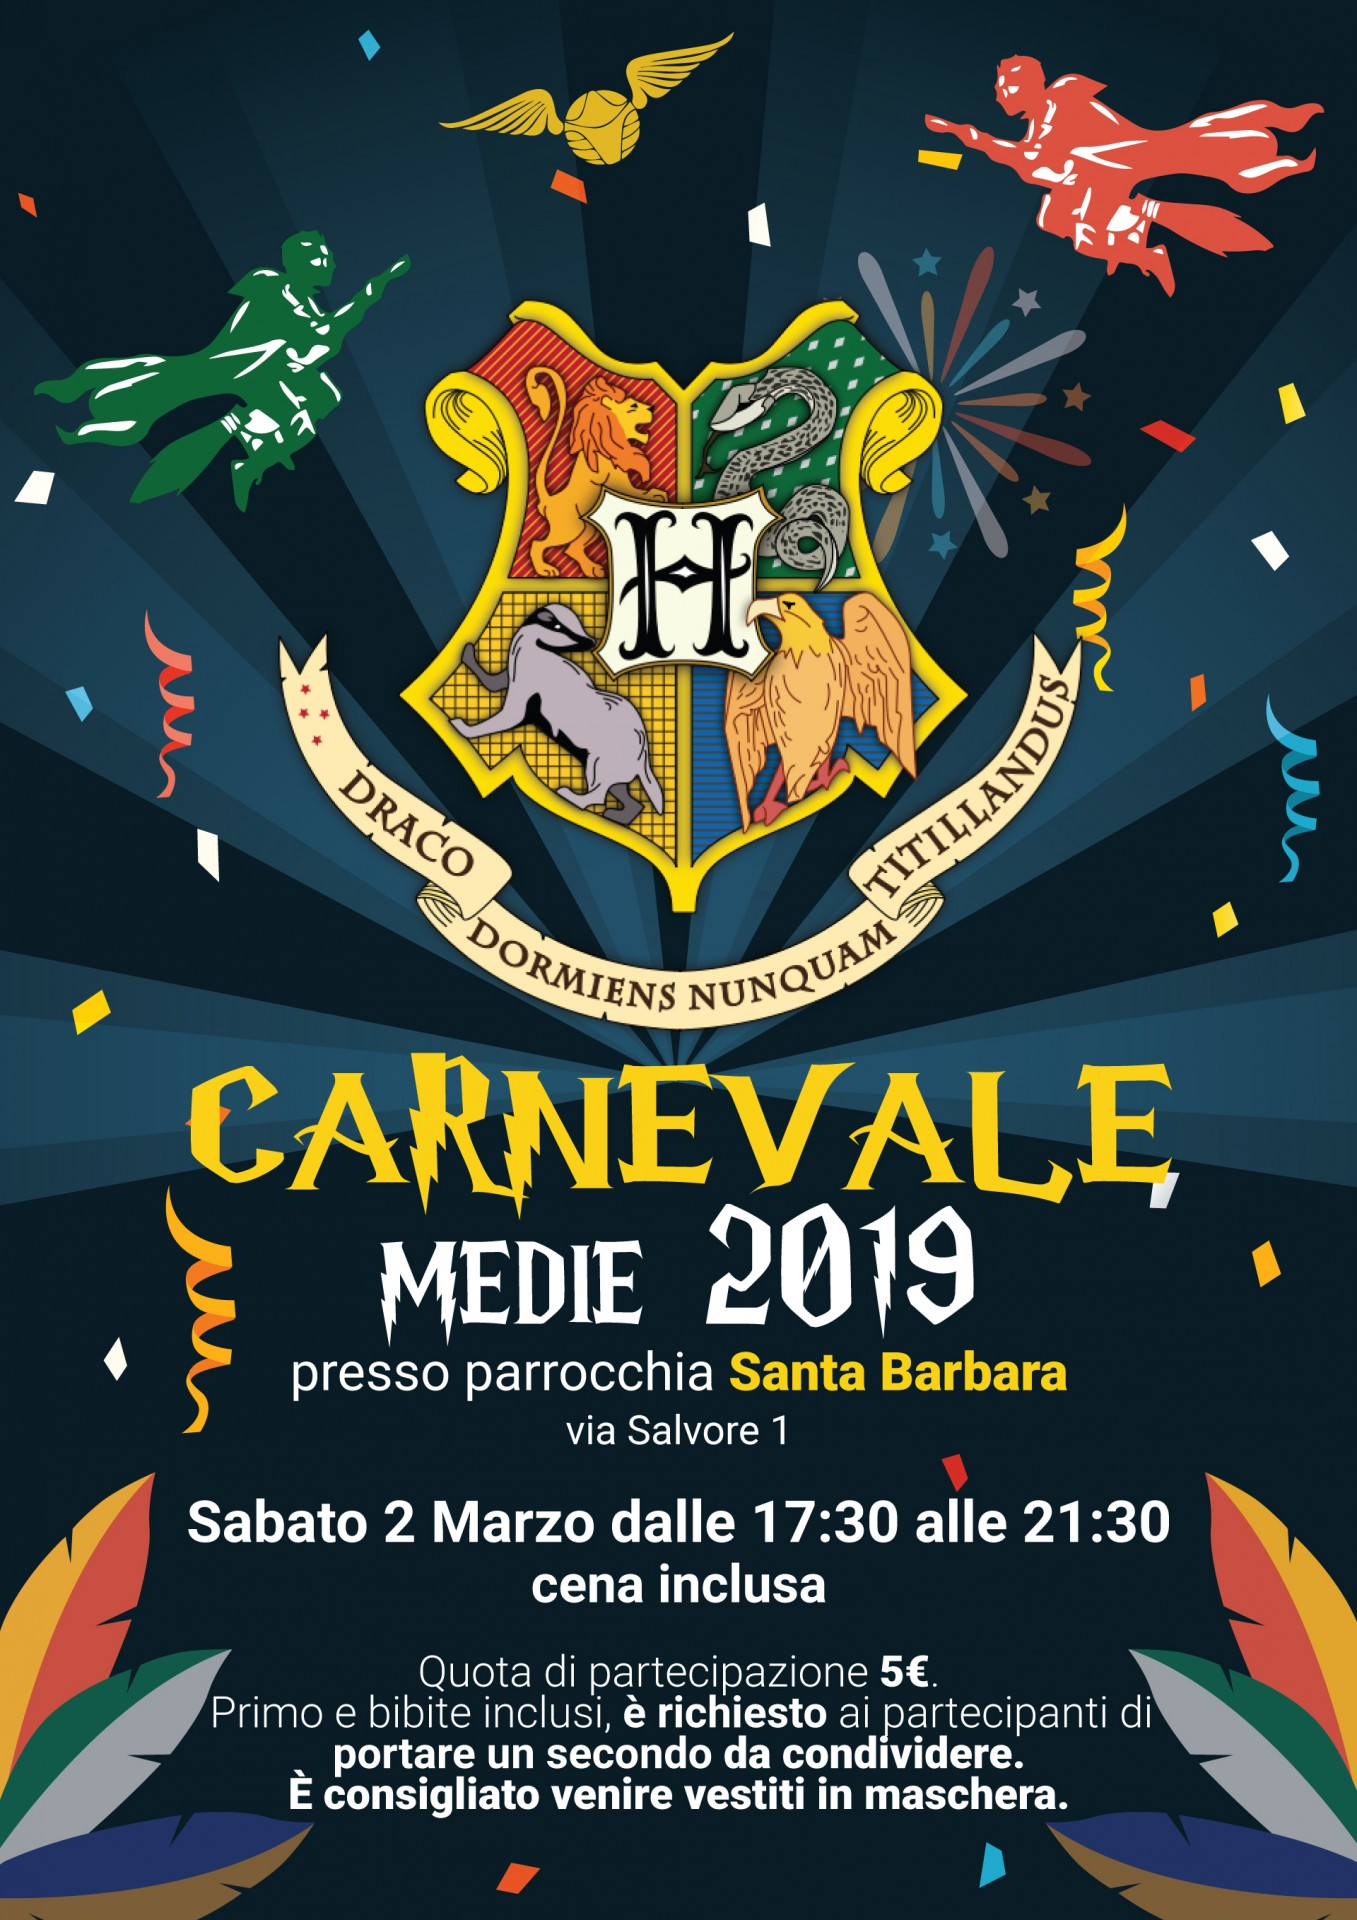 Carnevale Medie 2019 Locandina